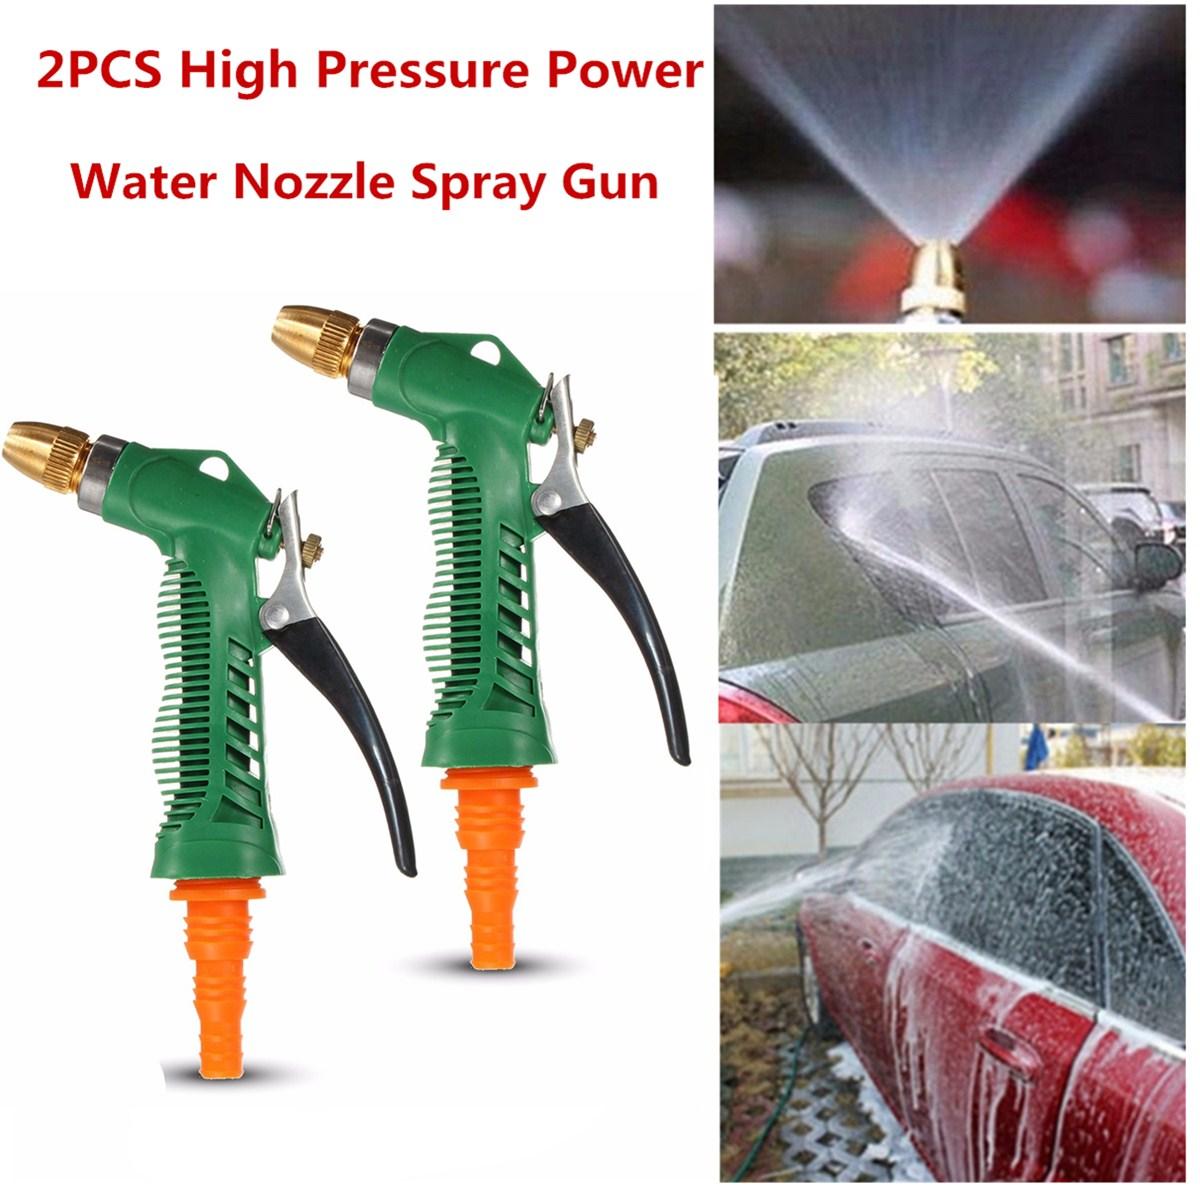 2 PCS Garden Hose Spray Gun Nozzle Sprayer Heavy Duty Metal Easy Flow Water Spray Gun Control Setting Ergonomic Trigger High Pressure Spary Nozzle for Car Washing /Plant Water 16.5